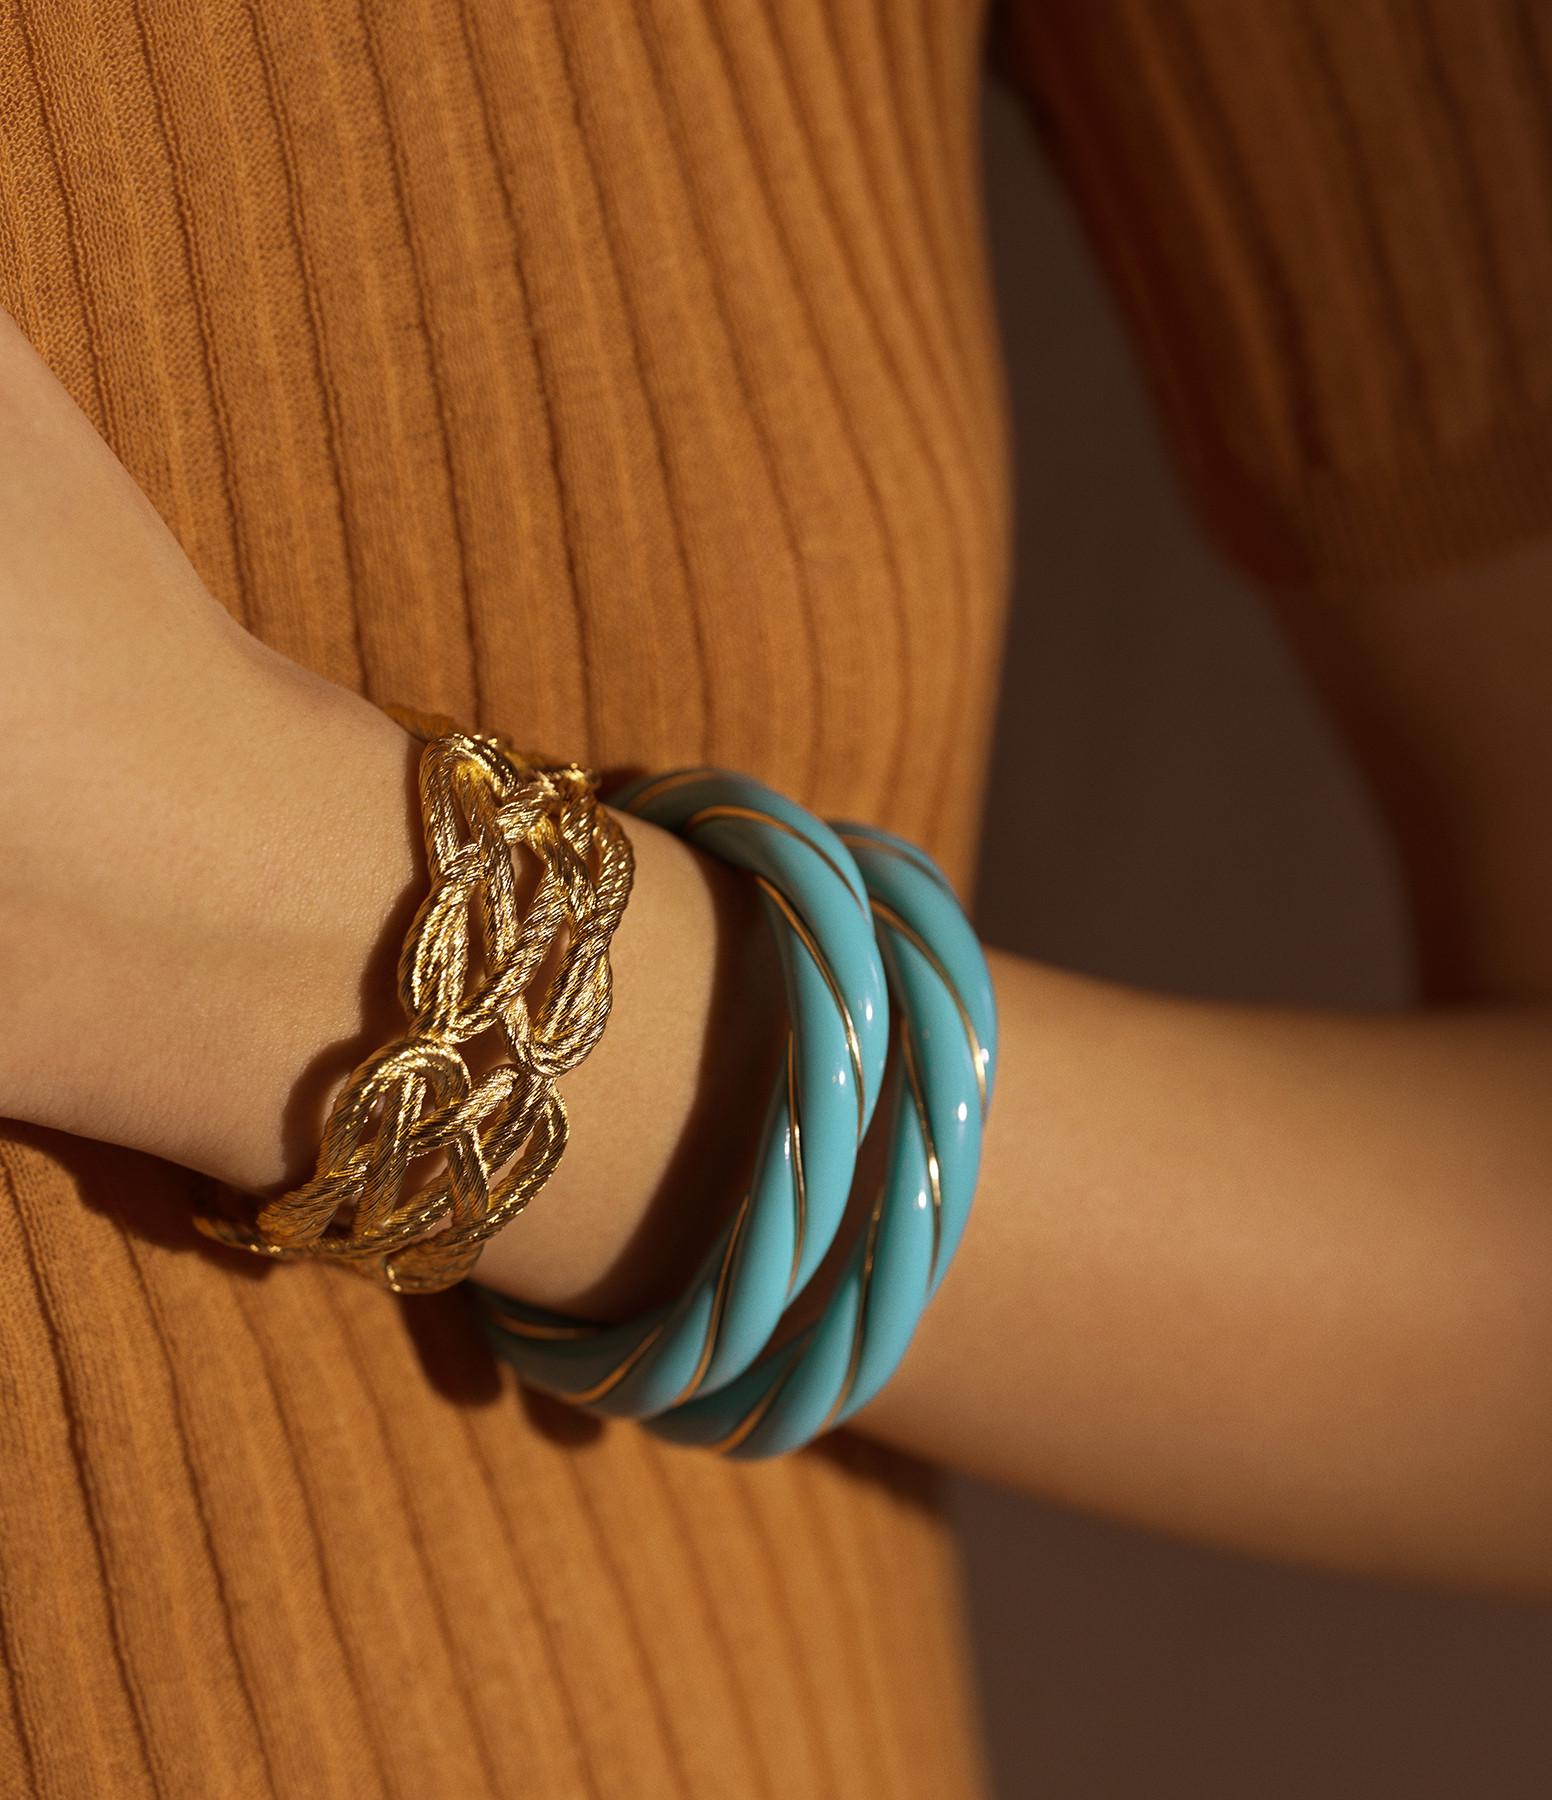 AURELIE BIDERMANN - Bracelet Diana Torsadé Turquoise